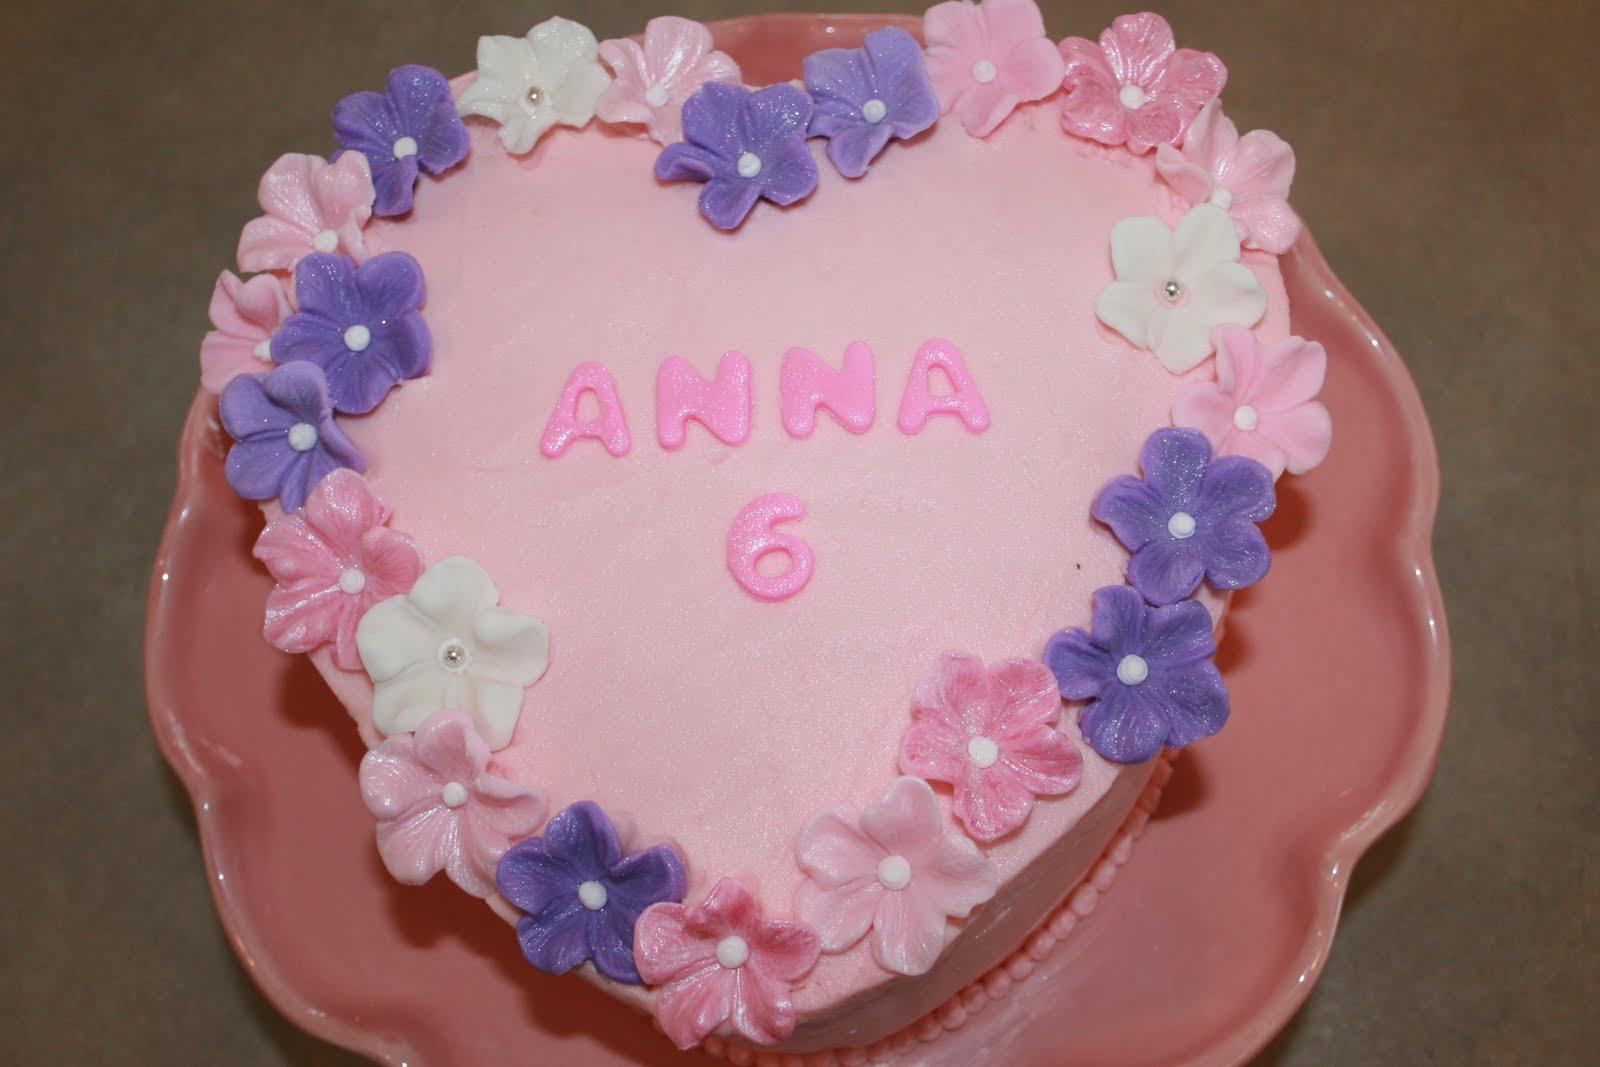 Heart Shaped Birthday Cake Design : Sweet cake design: heart shaped birthday cake